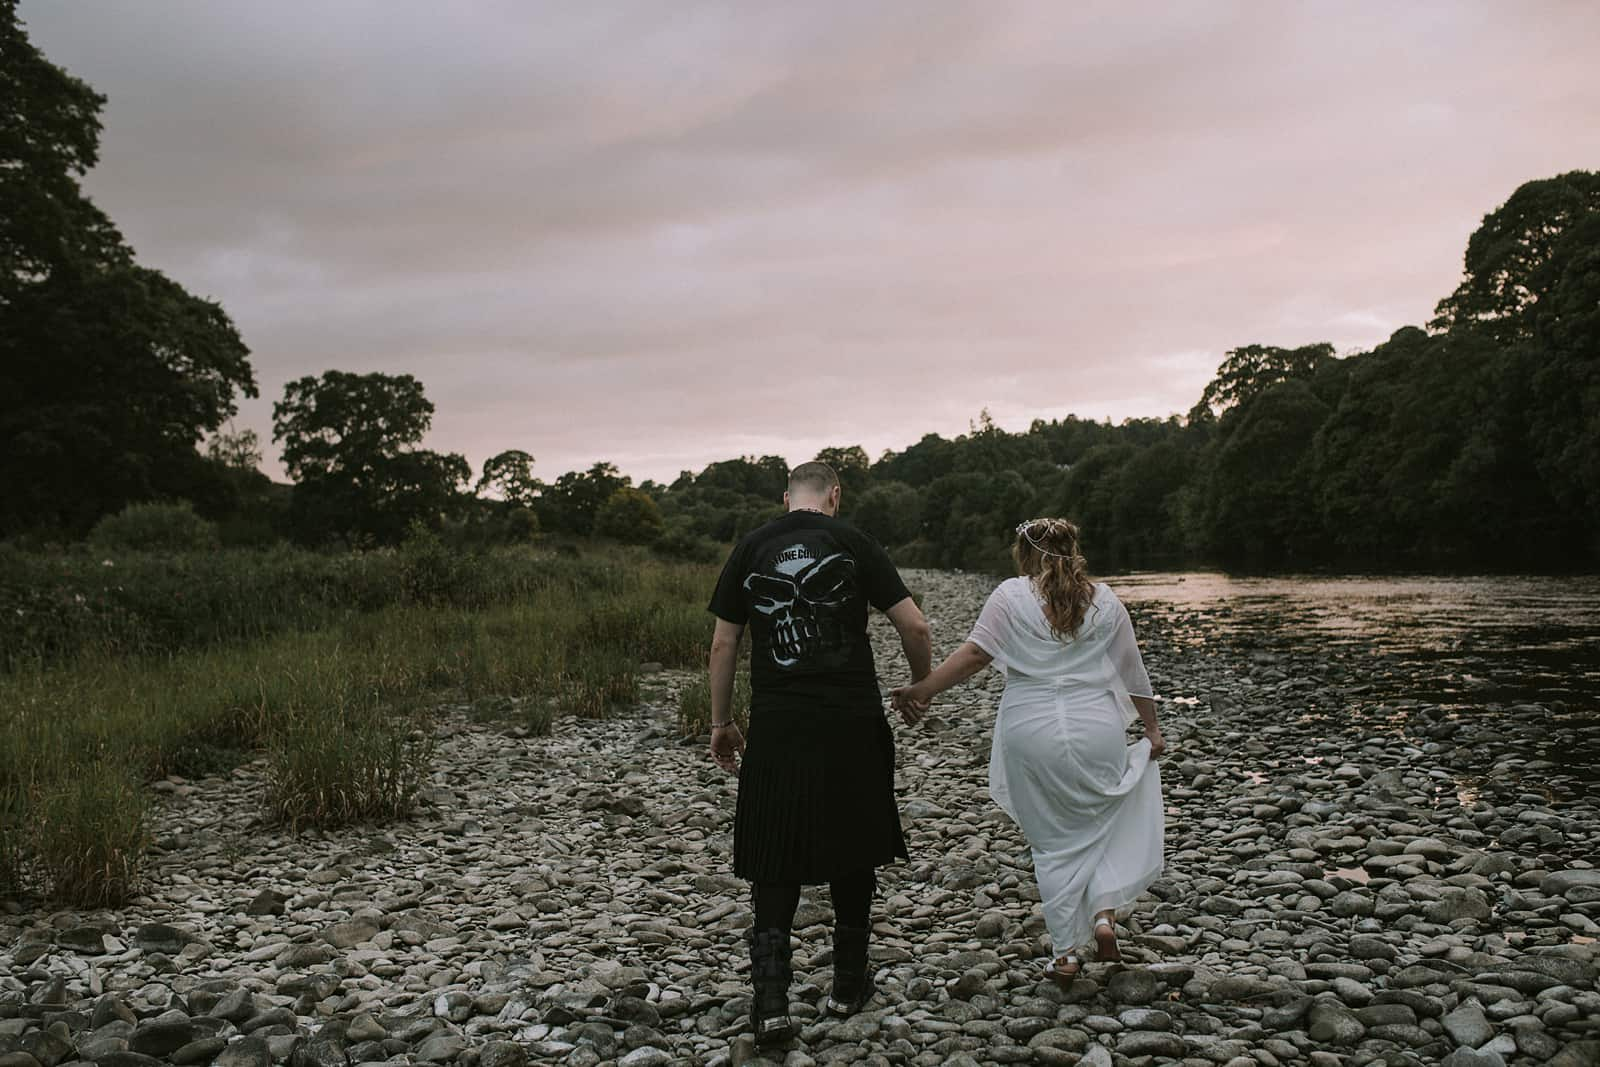 abbotsford house wedding photography